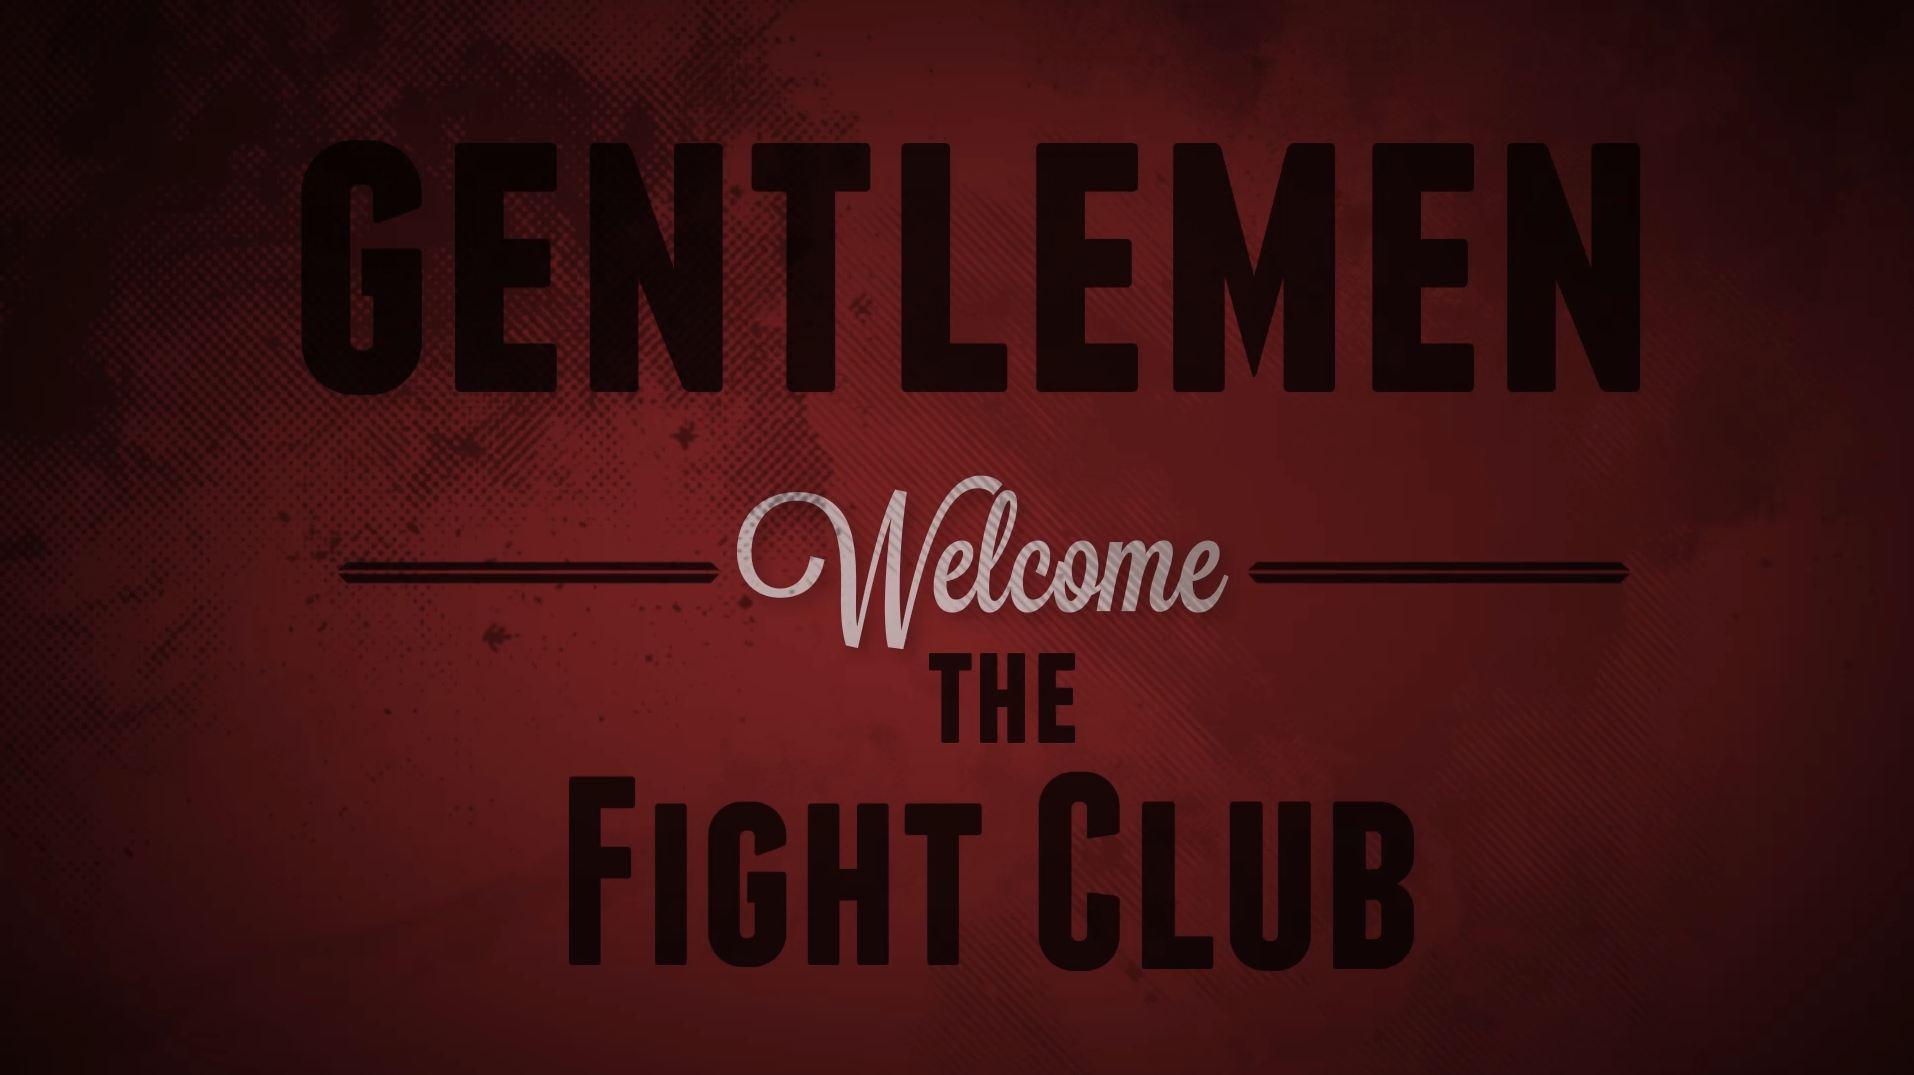 fight-club-kinetic-typography-still1.JPG